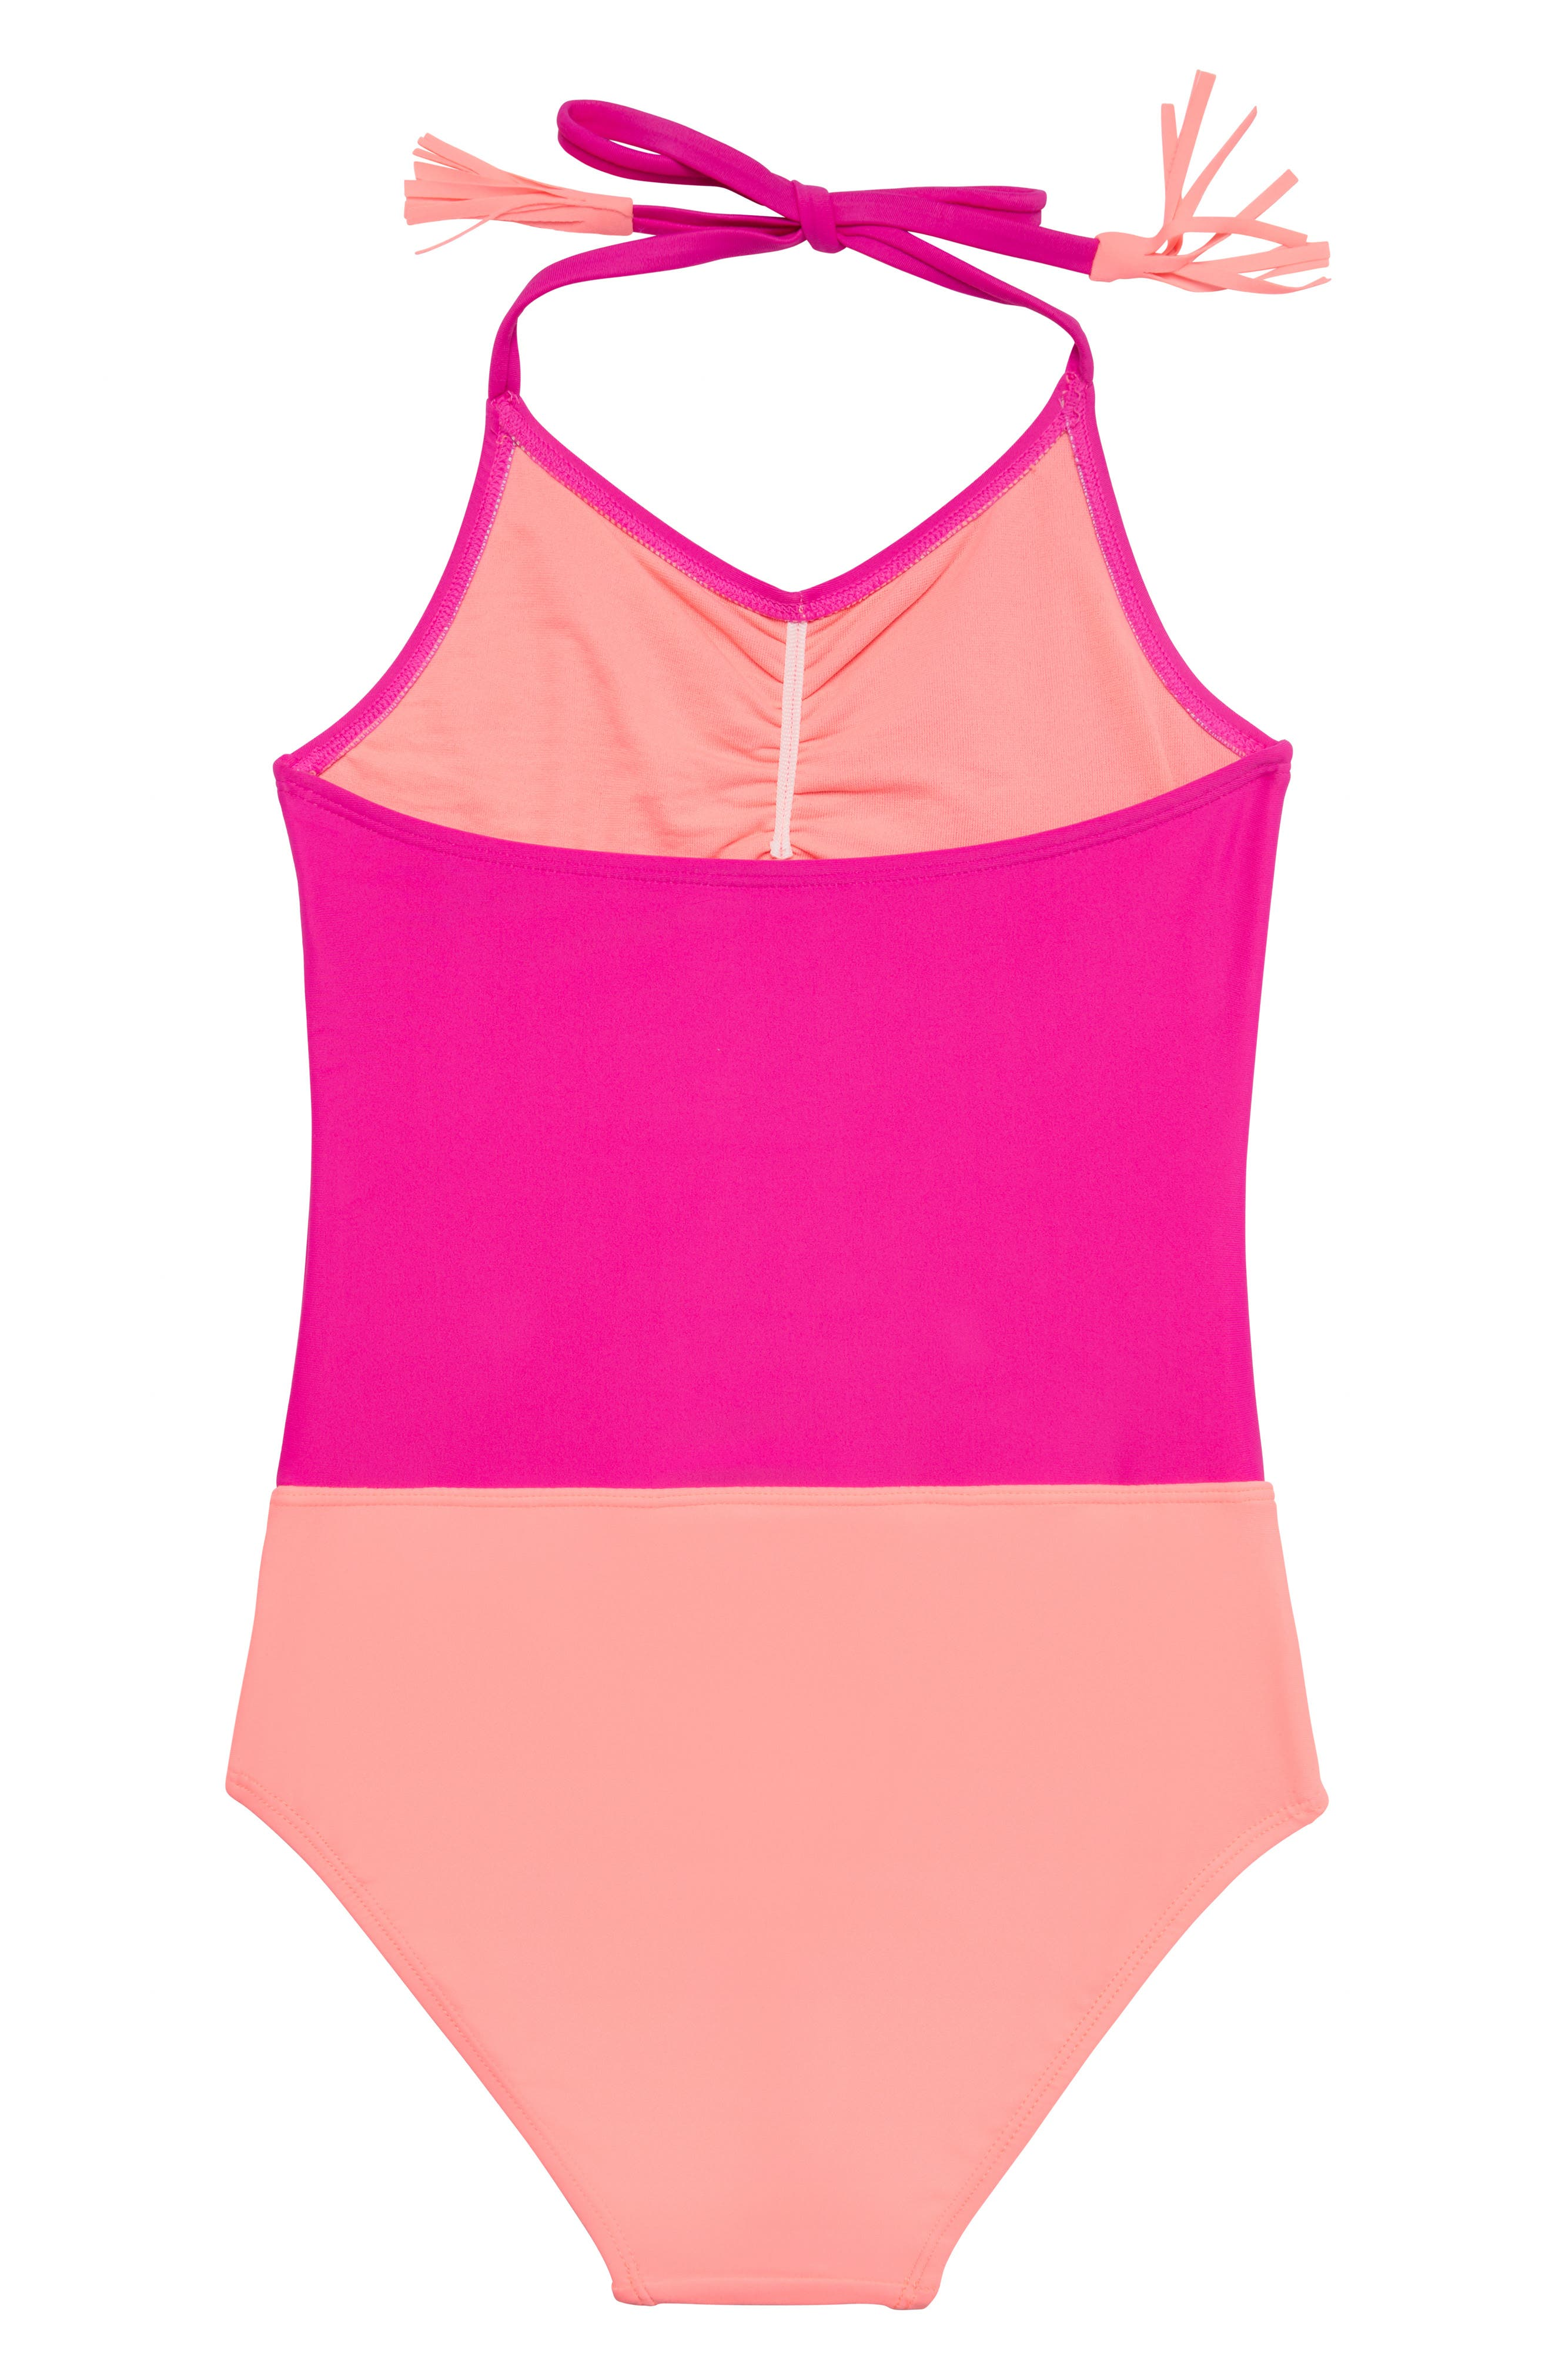 Malibu Stripe One-Piece Swimsuit,                             Alternate thumbnail 2, color,                             PINK/ MULTI